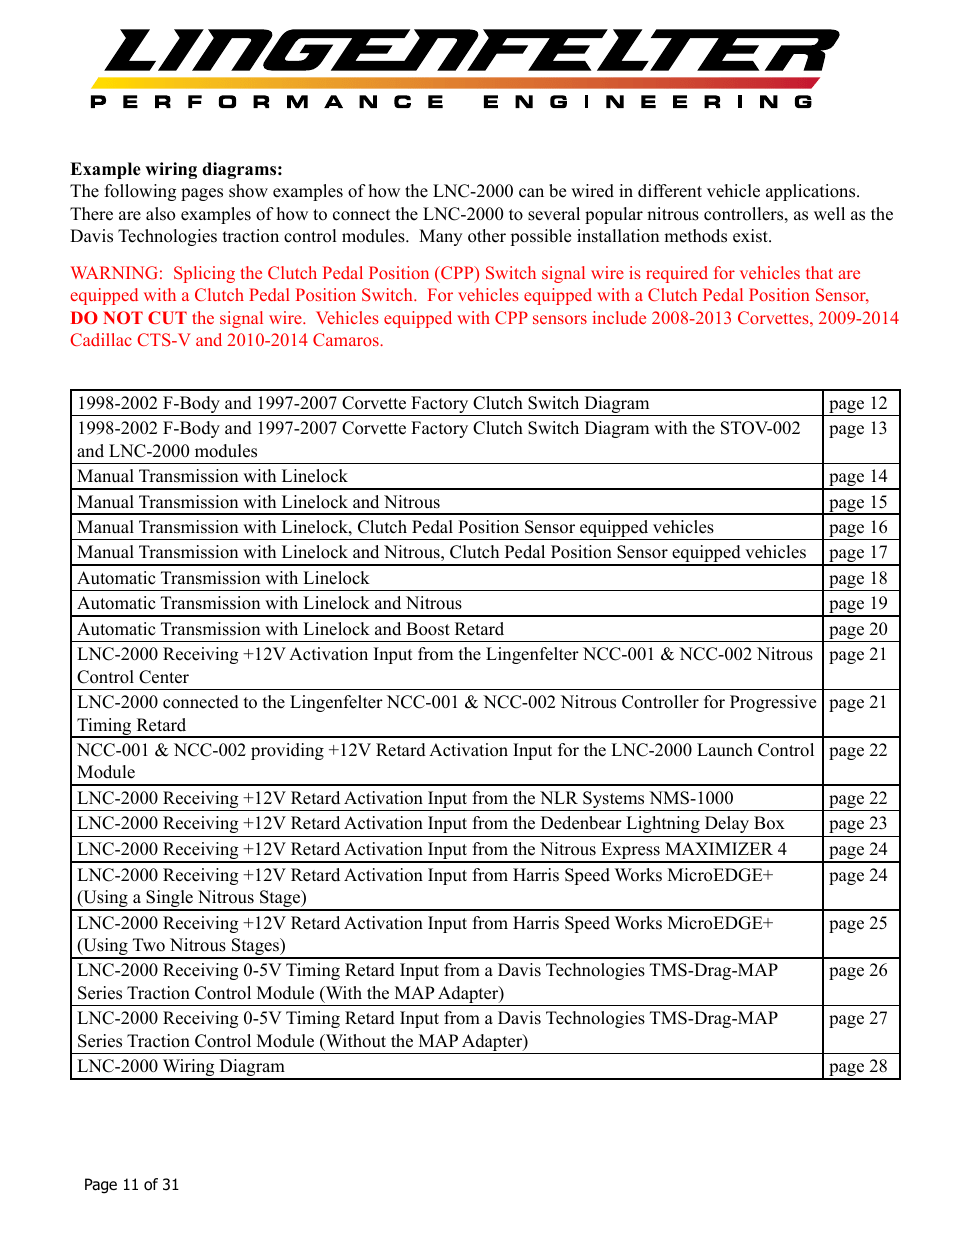 hight resolution of lingenfelter l460145297 lingenfelter lnc 2000 ls timing retard launch controller v2 0 user manual page 12 32